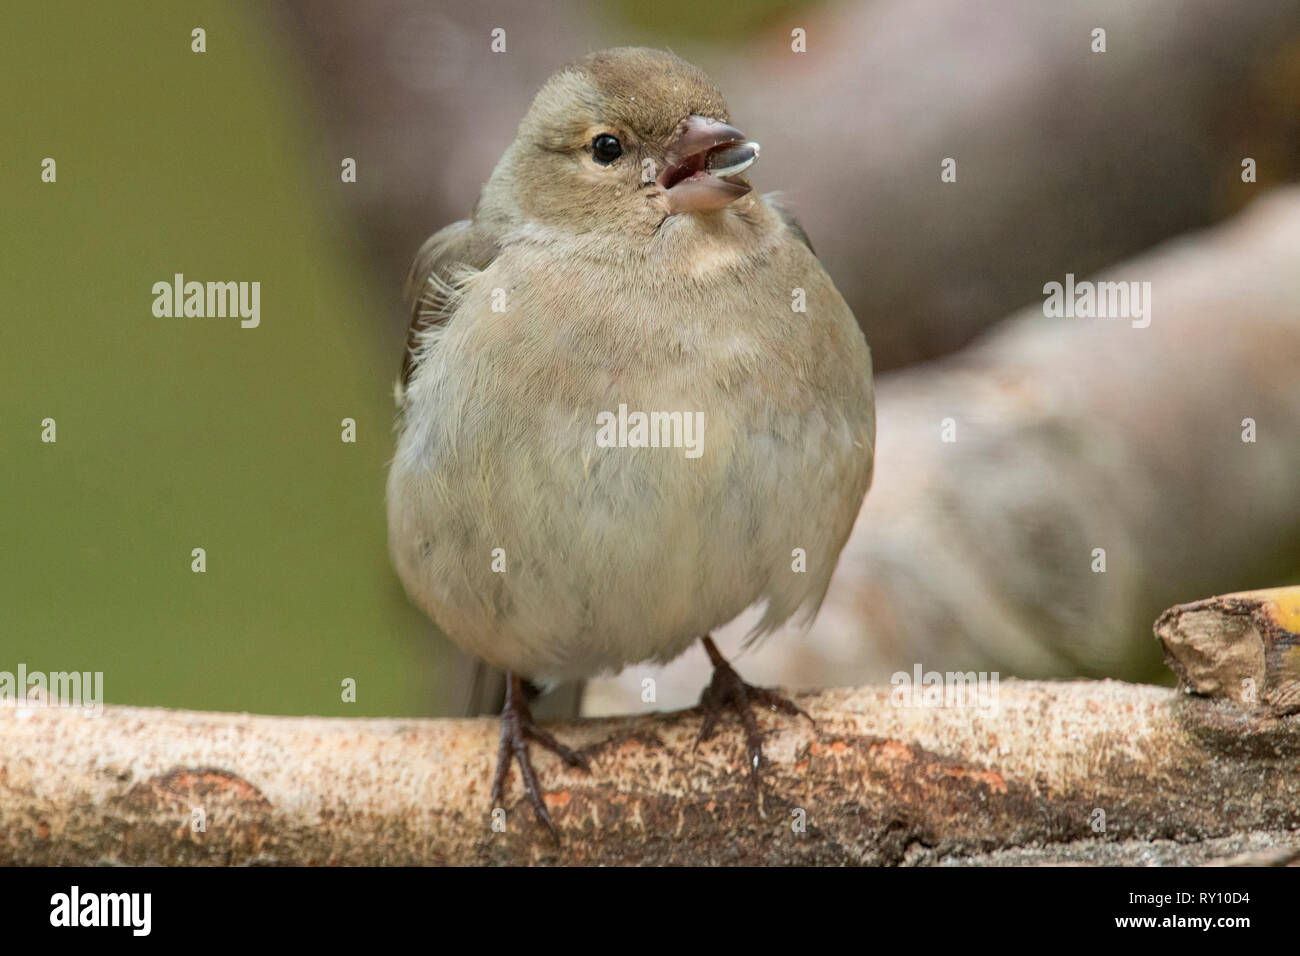 common chaffinch, female, (Fringilla coelebs) Stock Photo